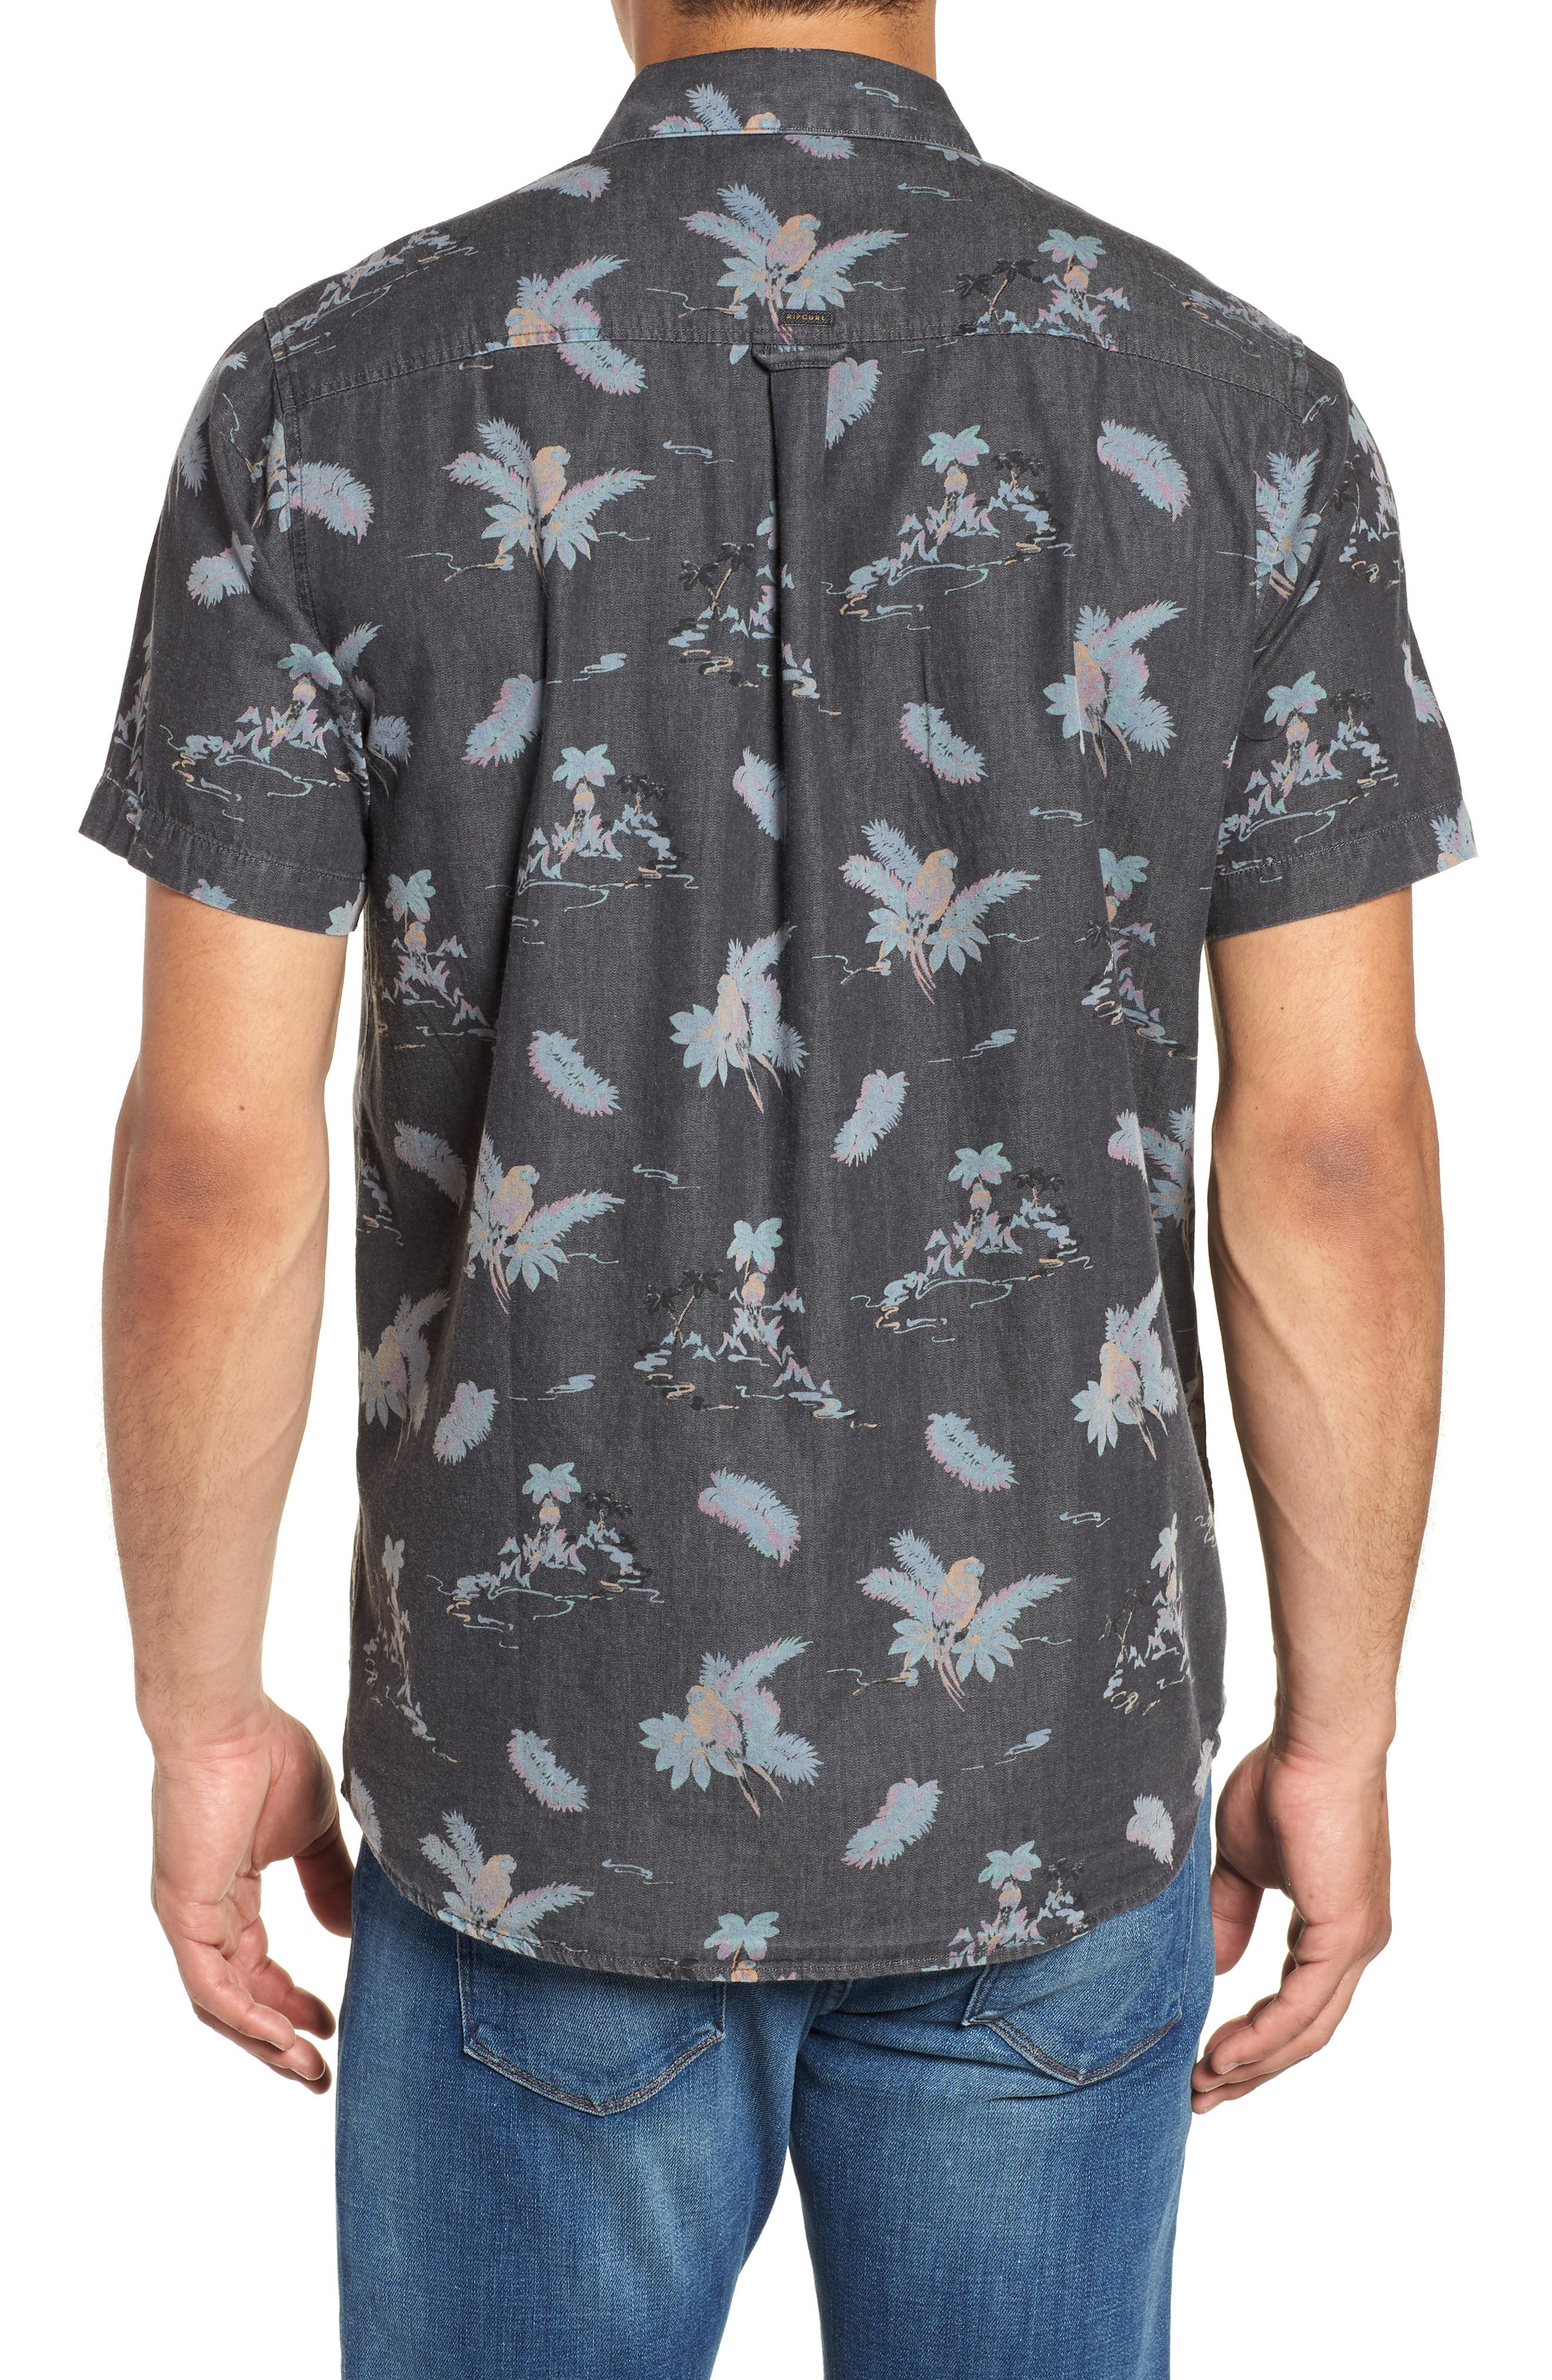 Meledrone Woven Shirt,                             Alternate thumbnail 3, color,